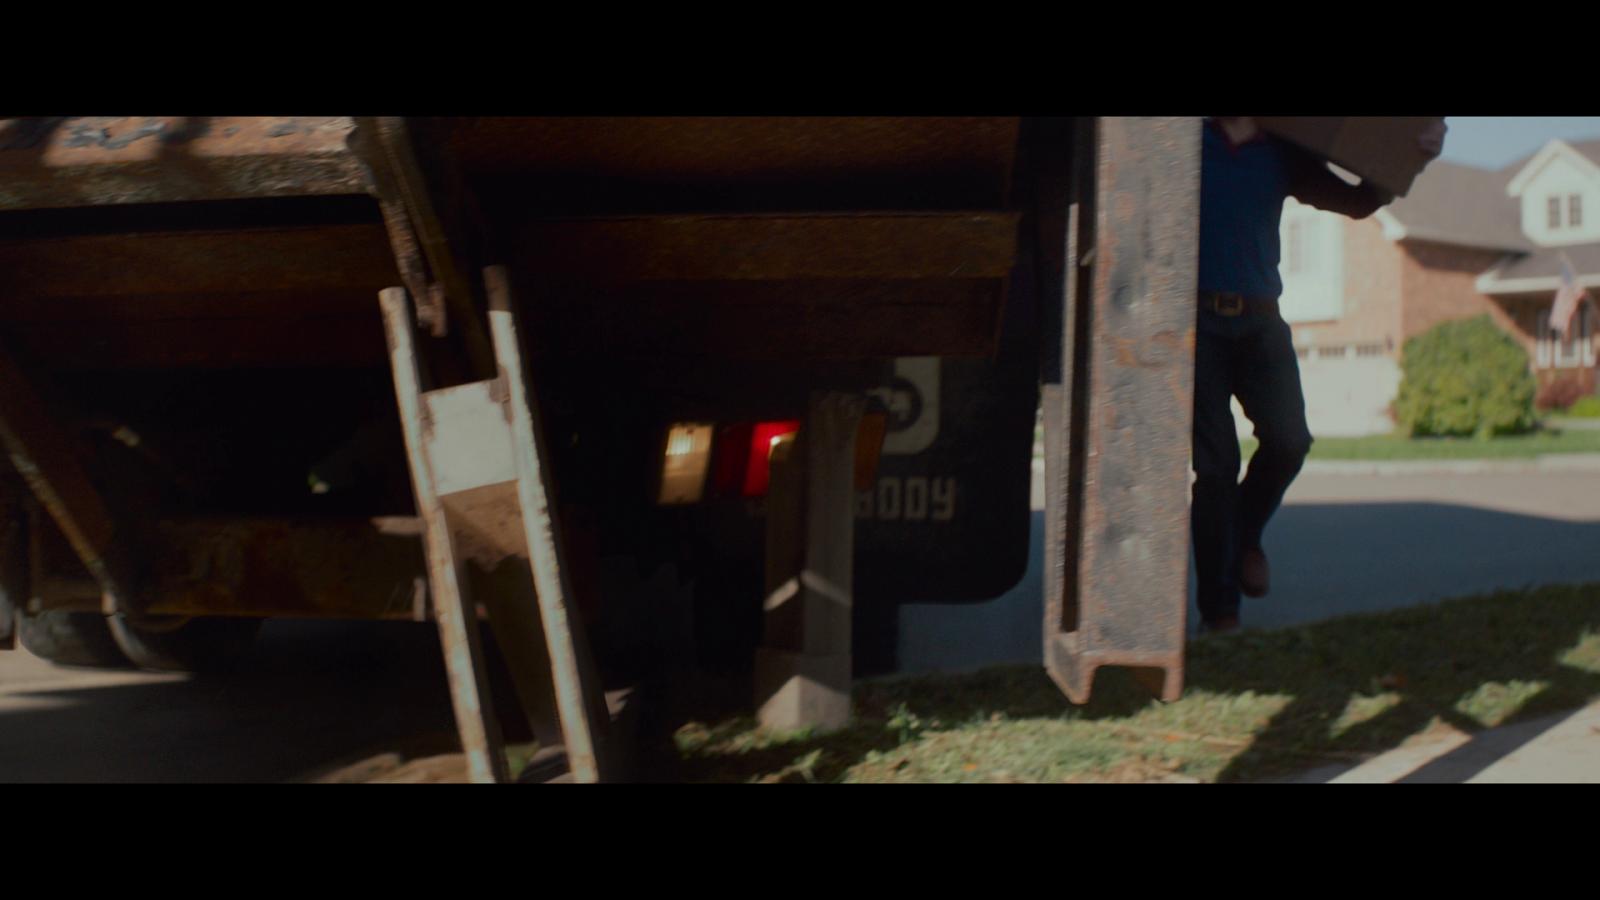 Poltergeist (2015) 1080p BD25 2D y 3D 1